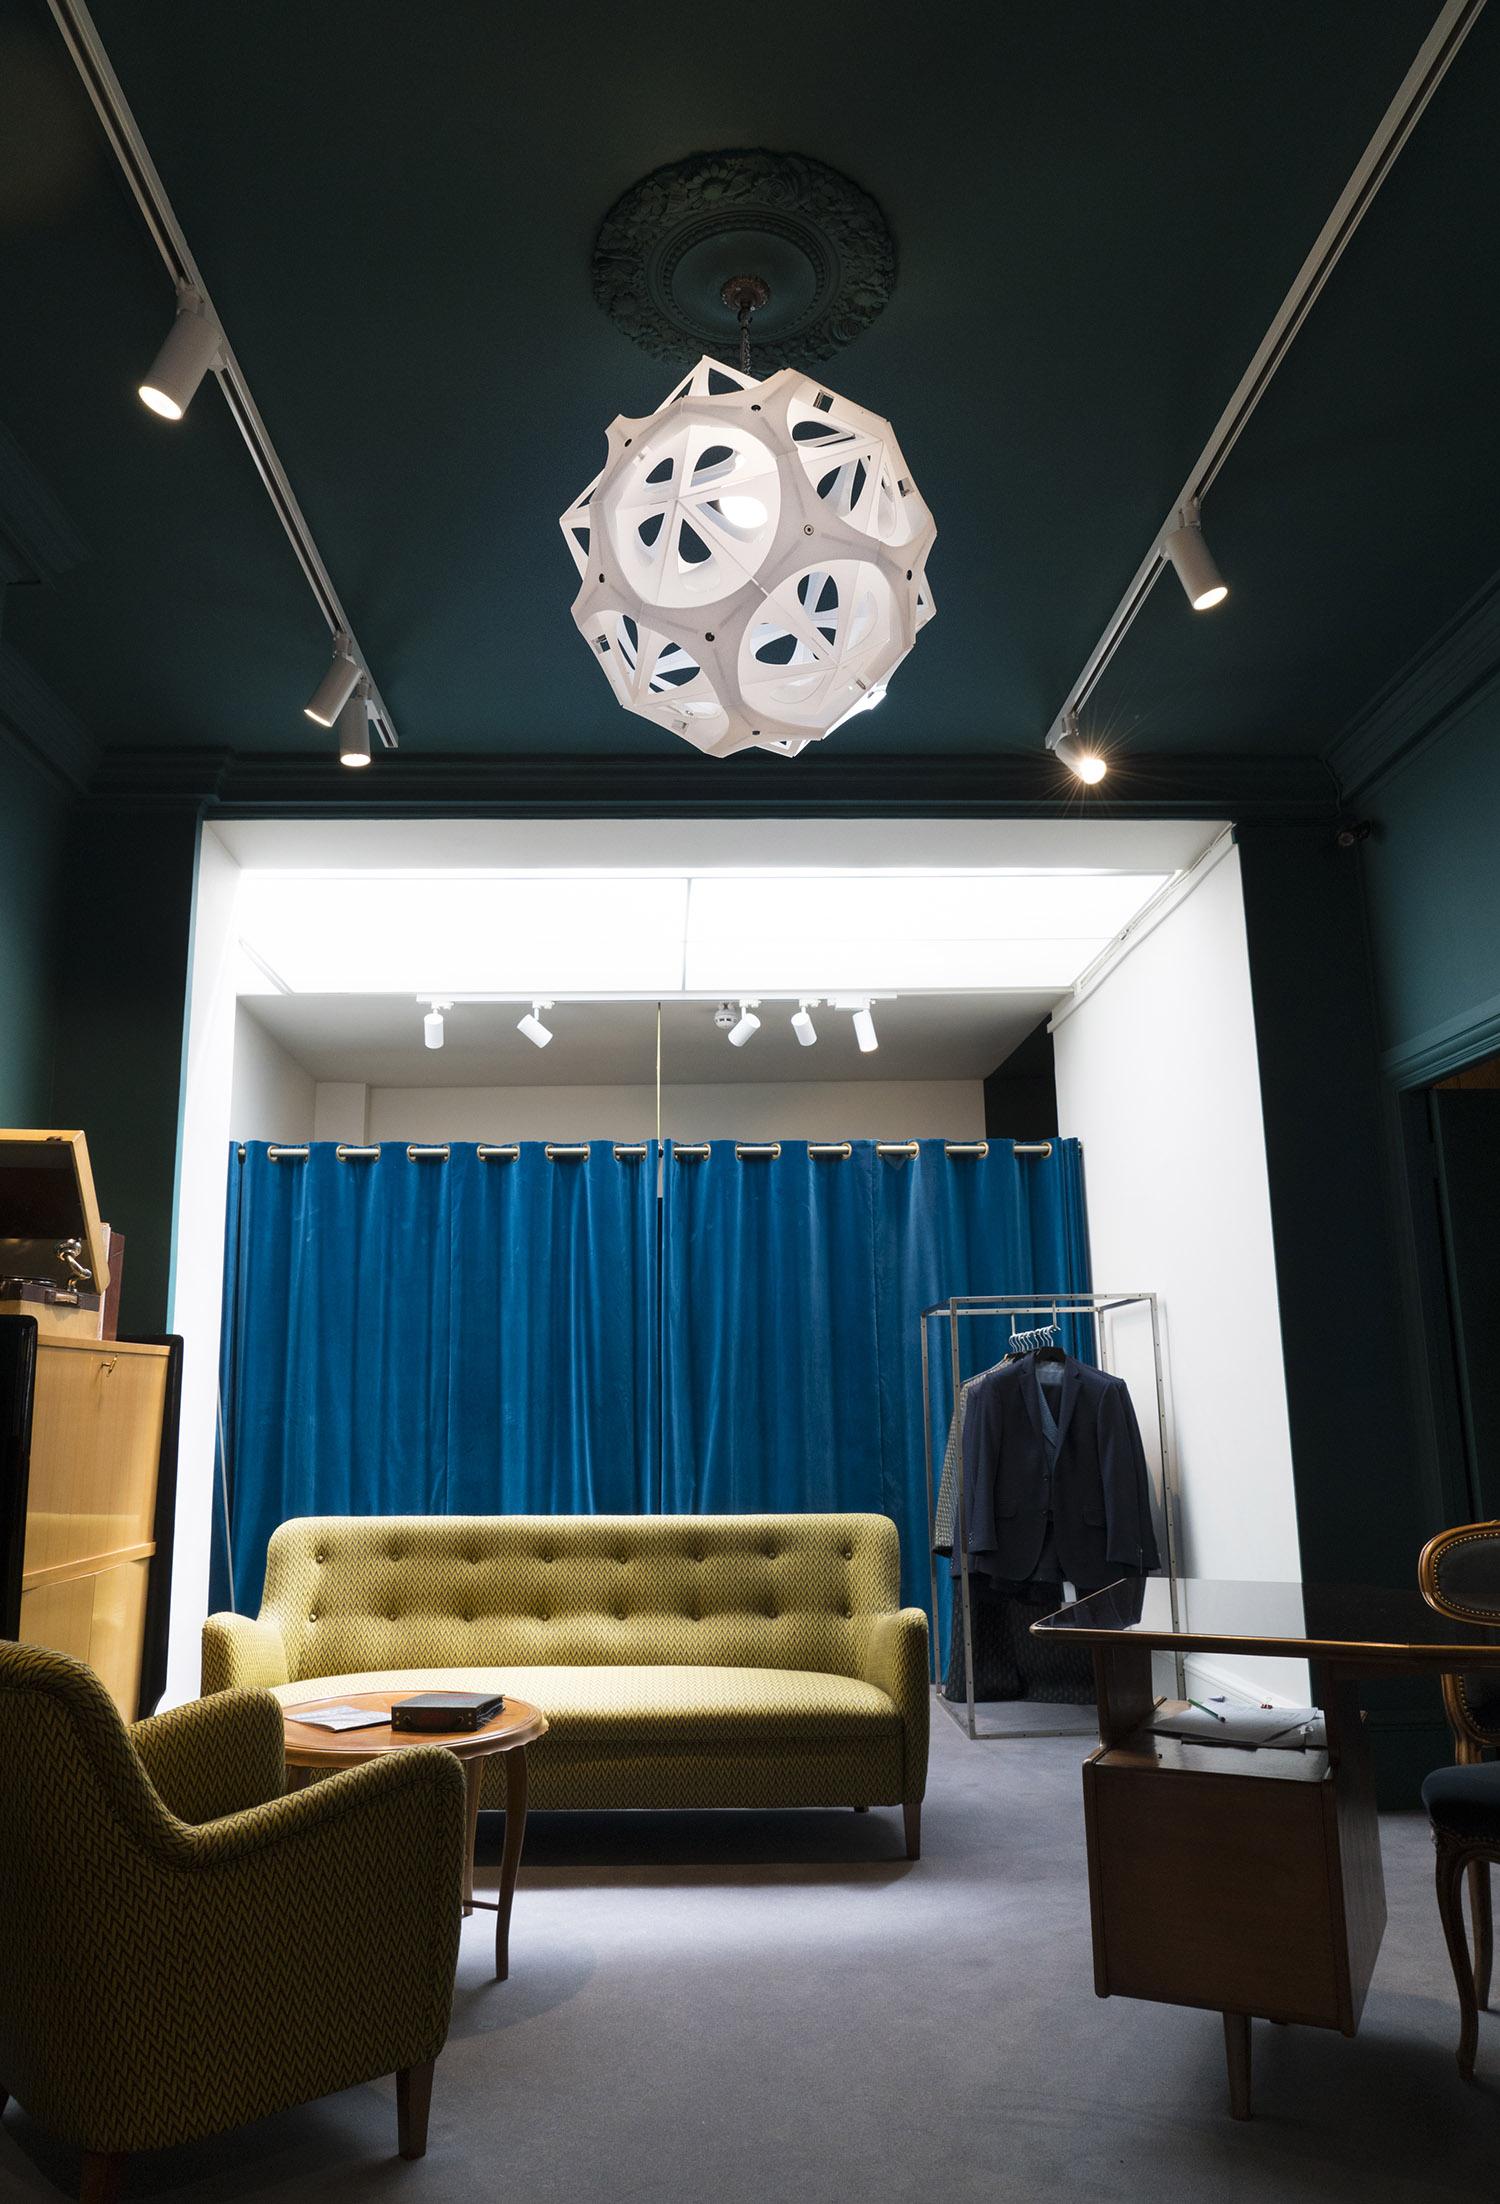 web222-Borealis-lamp-Pedro-Cerisola-in-situ-at-Dashing_Tweeds-London-MarionFriedmannGallery.jpg